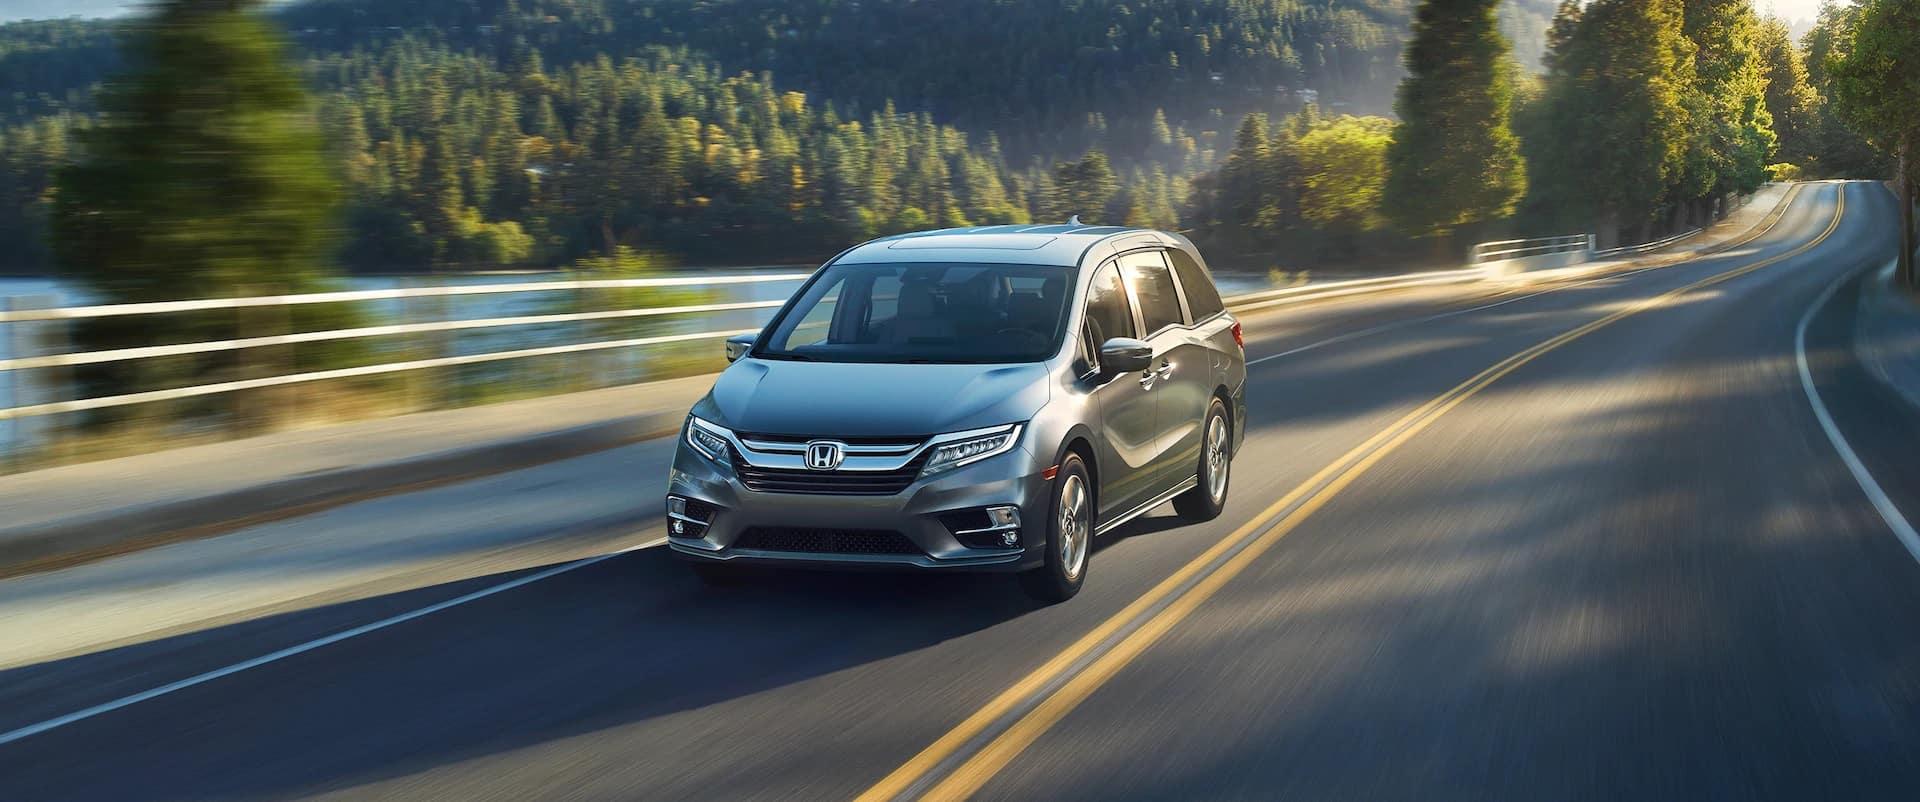 Honda_Odyssey_Driving_Next_To_Lake